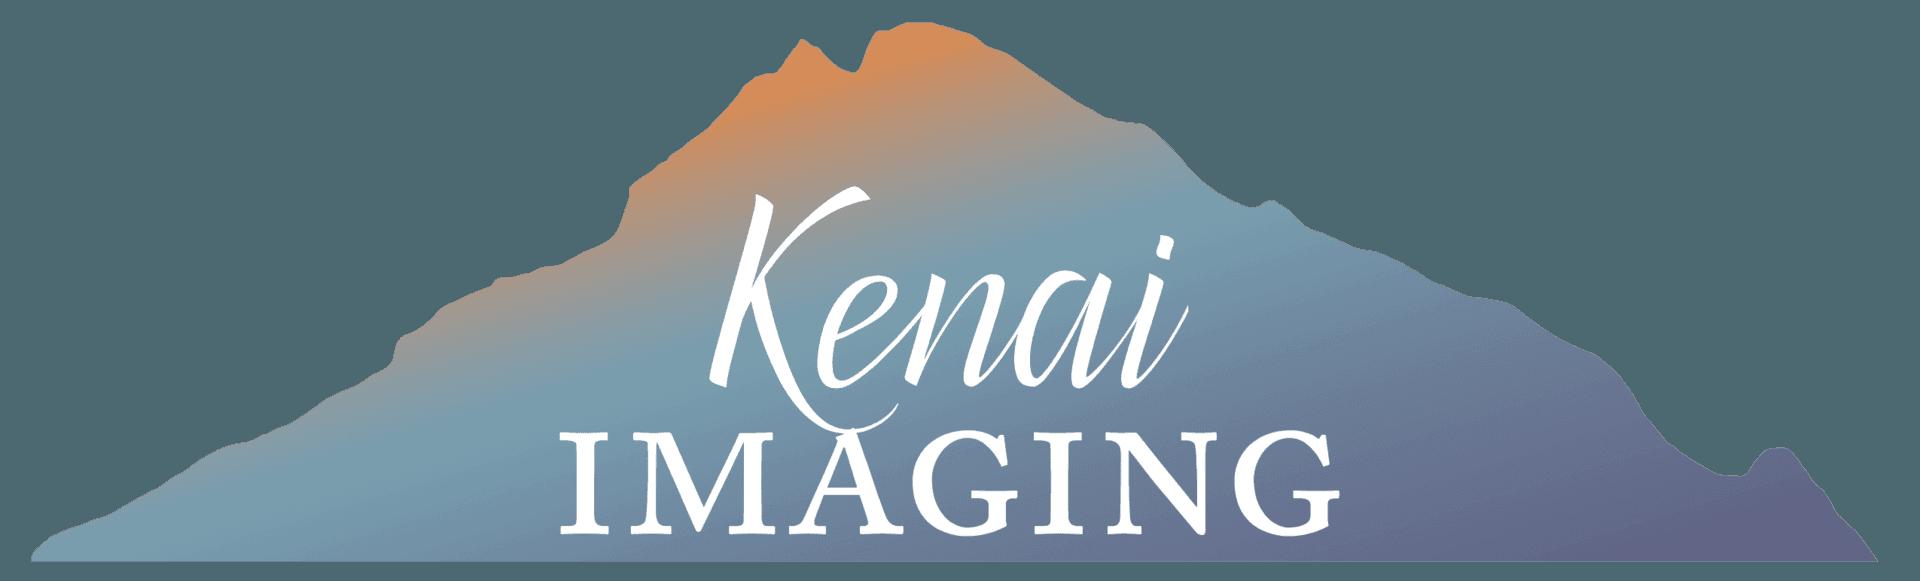 Kenai Imaging Center